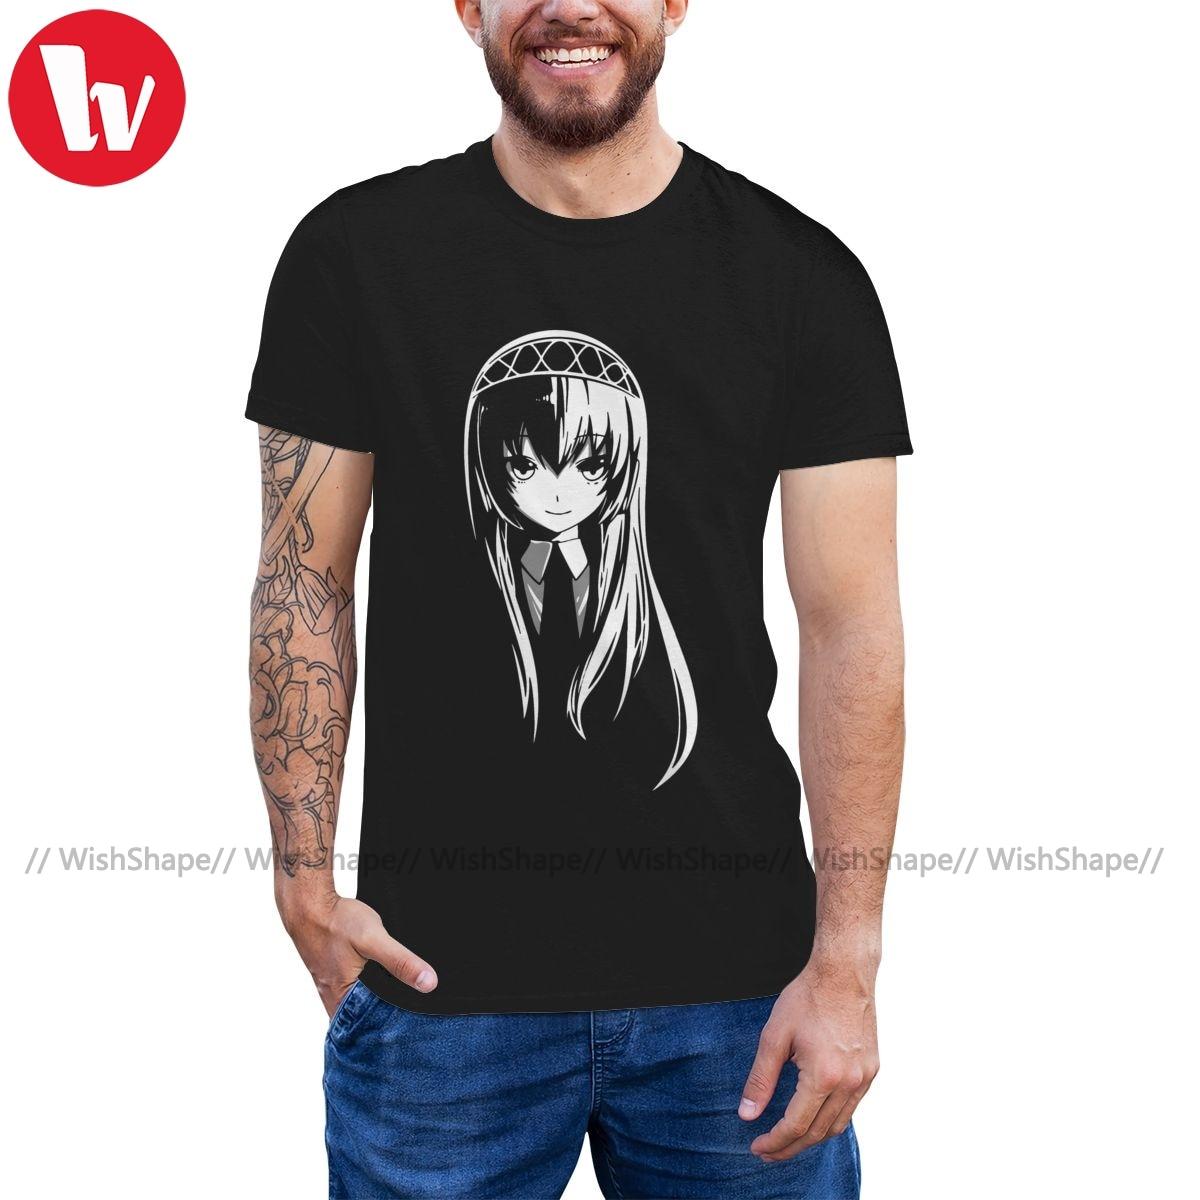 vocaloid-camiseta-de-megurine-luka-para-hombre-camisa-de-playa-xxx-100-de-algodon-camiseta-estampada-de-manga-corta-impresionante